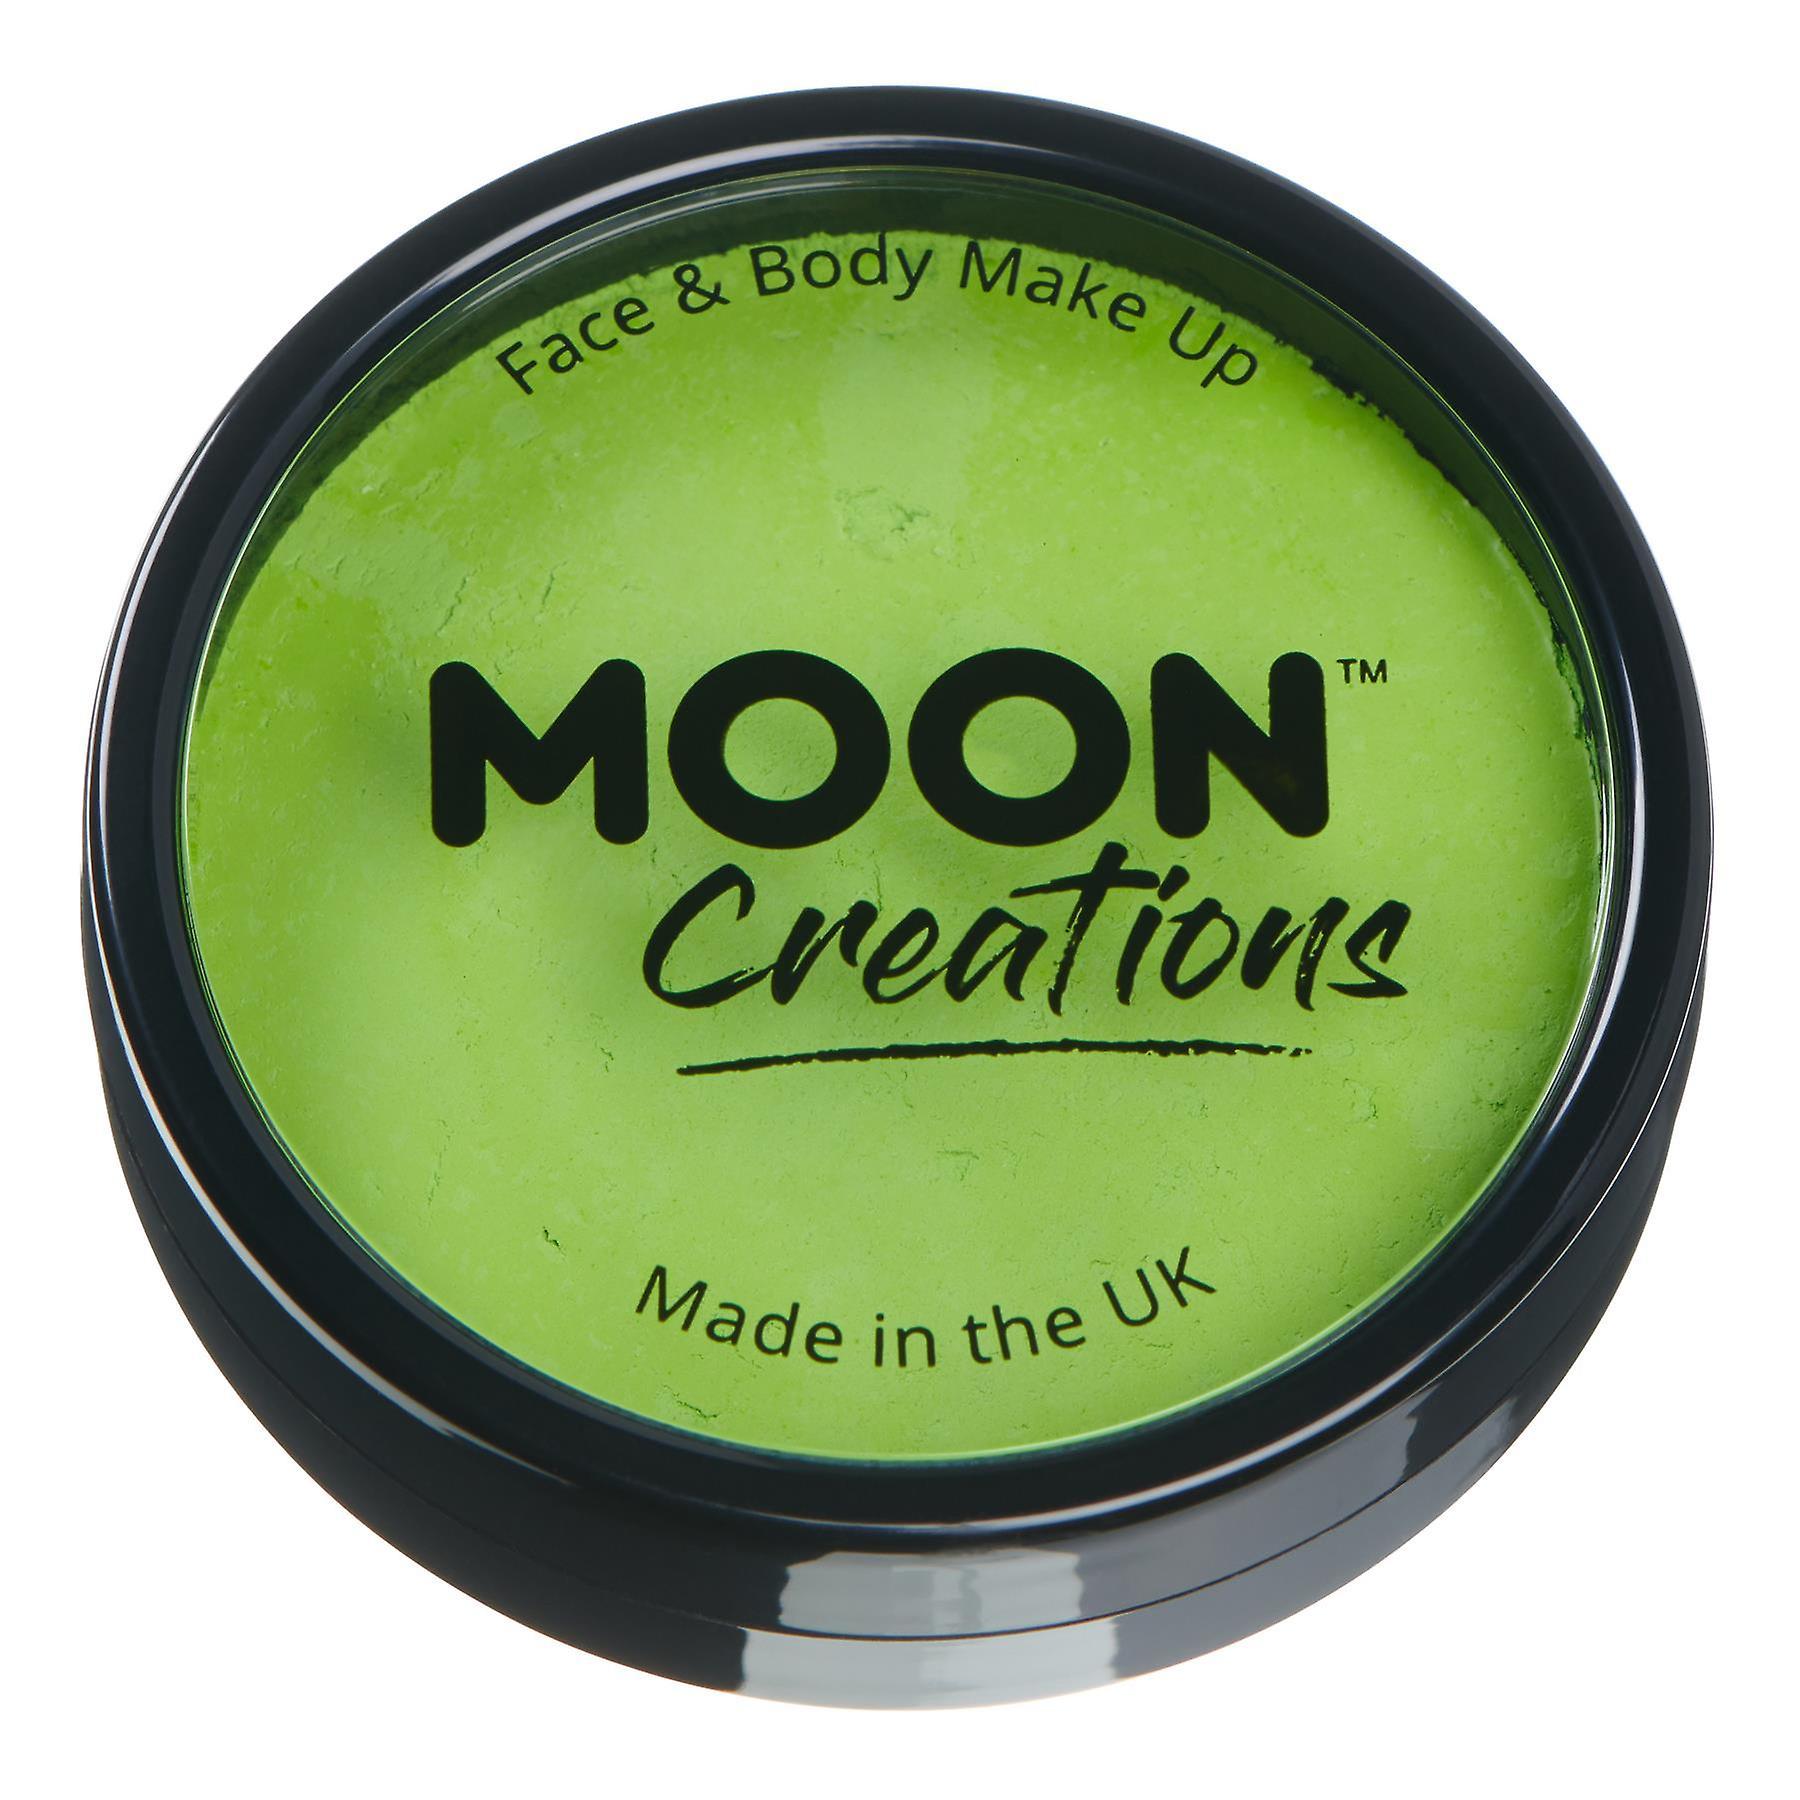 Moon Creations - Pro Face & Body Paint Cake Pots - Light Green